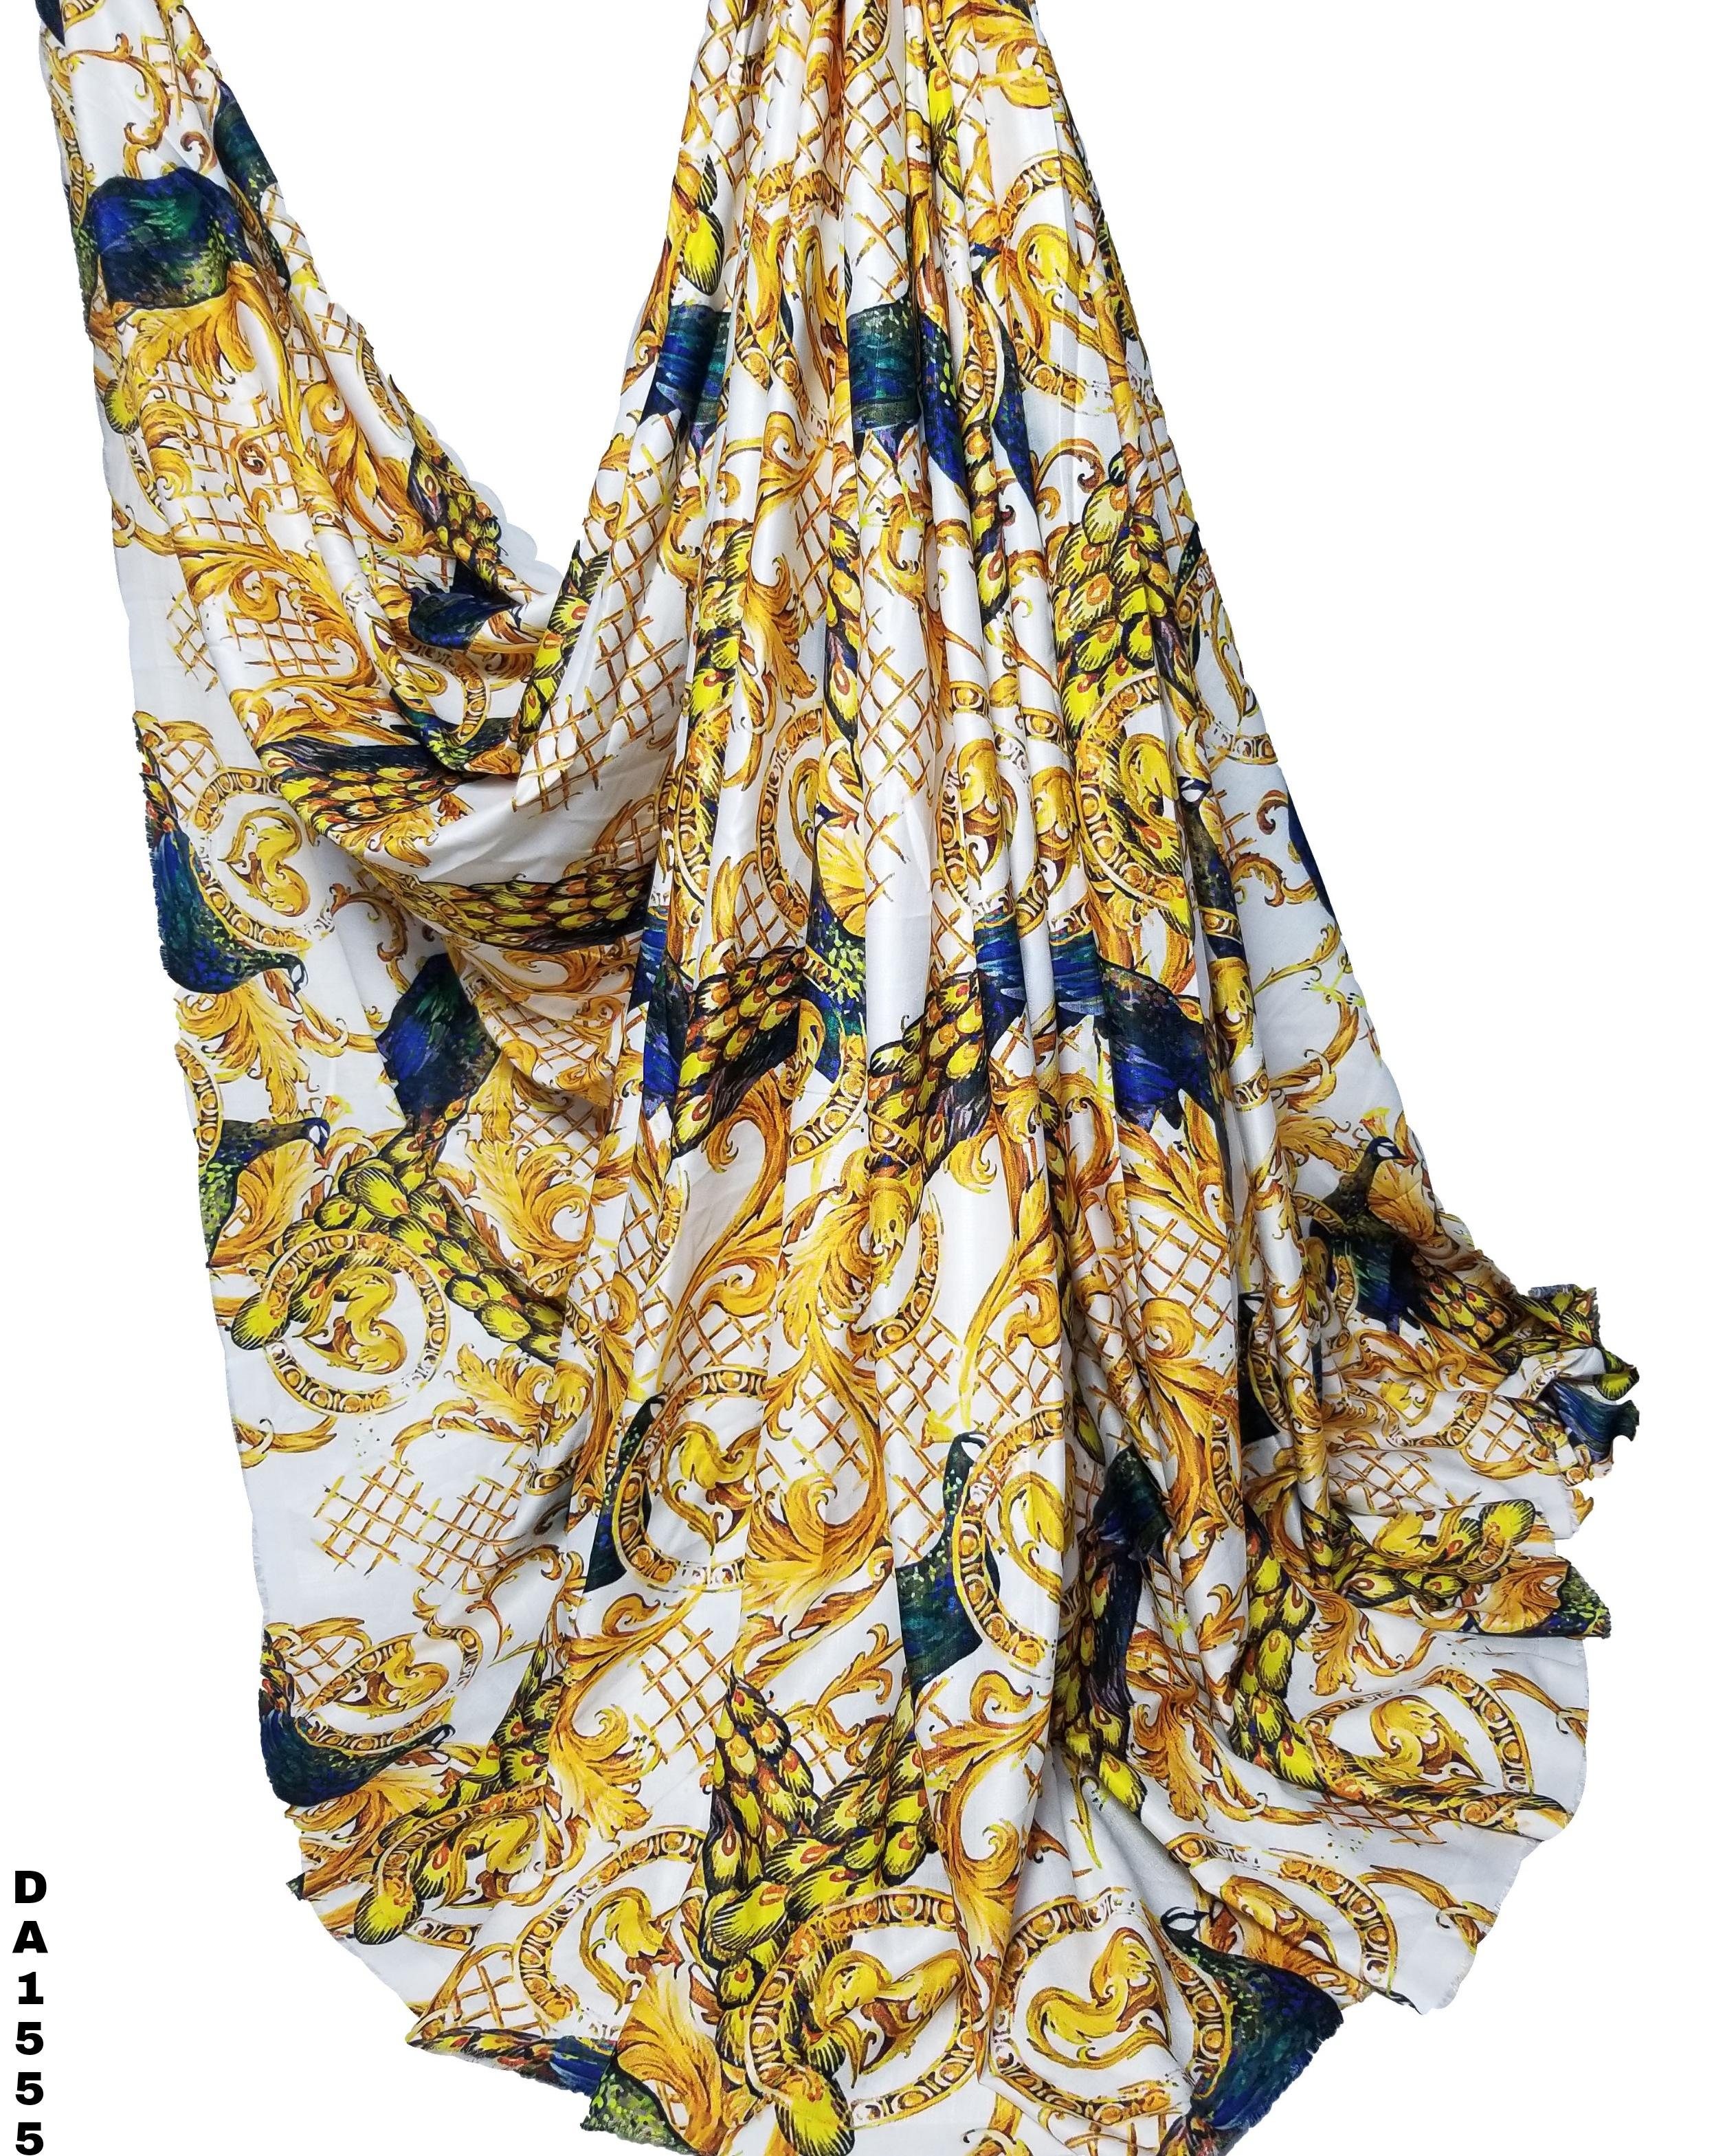 Golden Peacock Design Khadi Rayon Digital Print Fabric